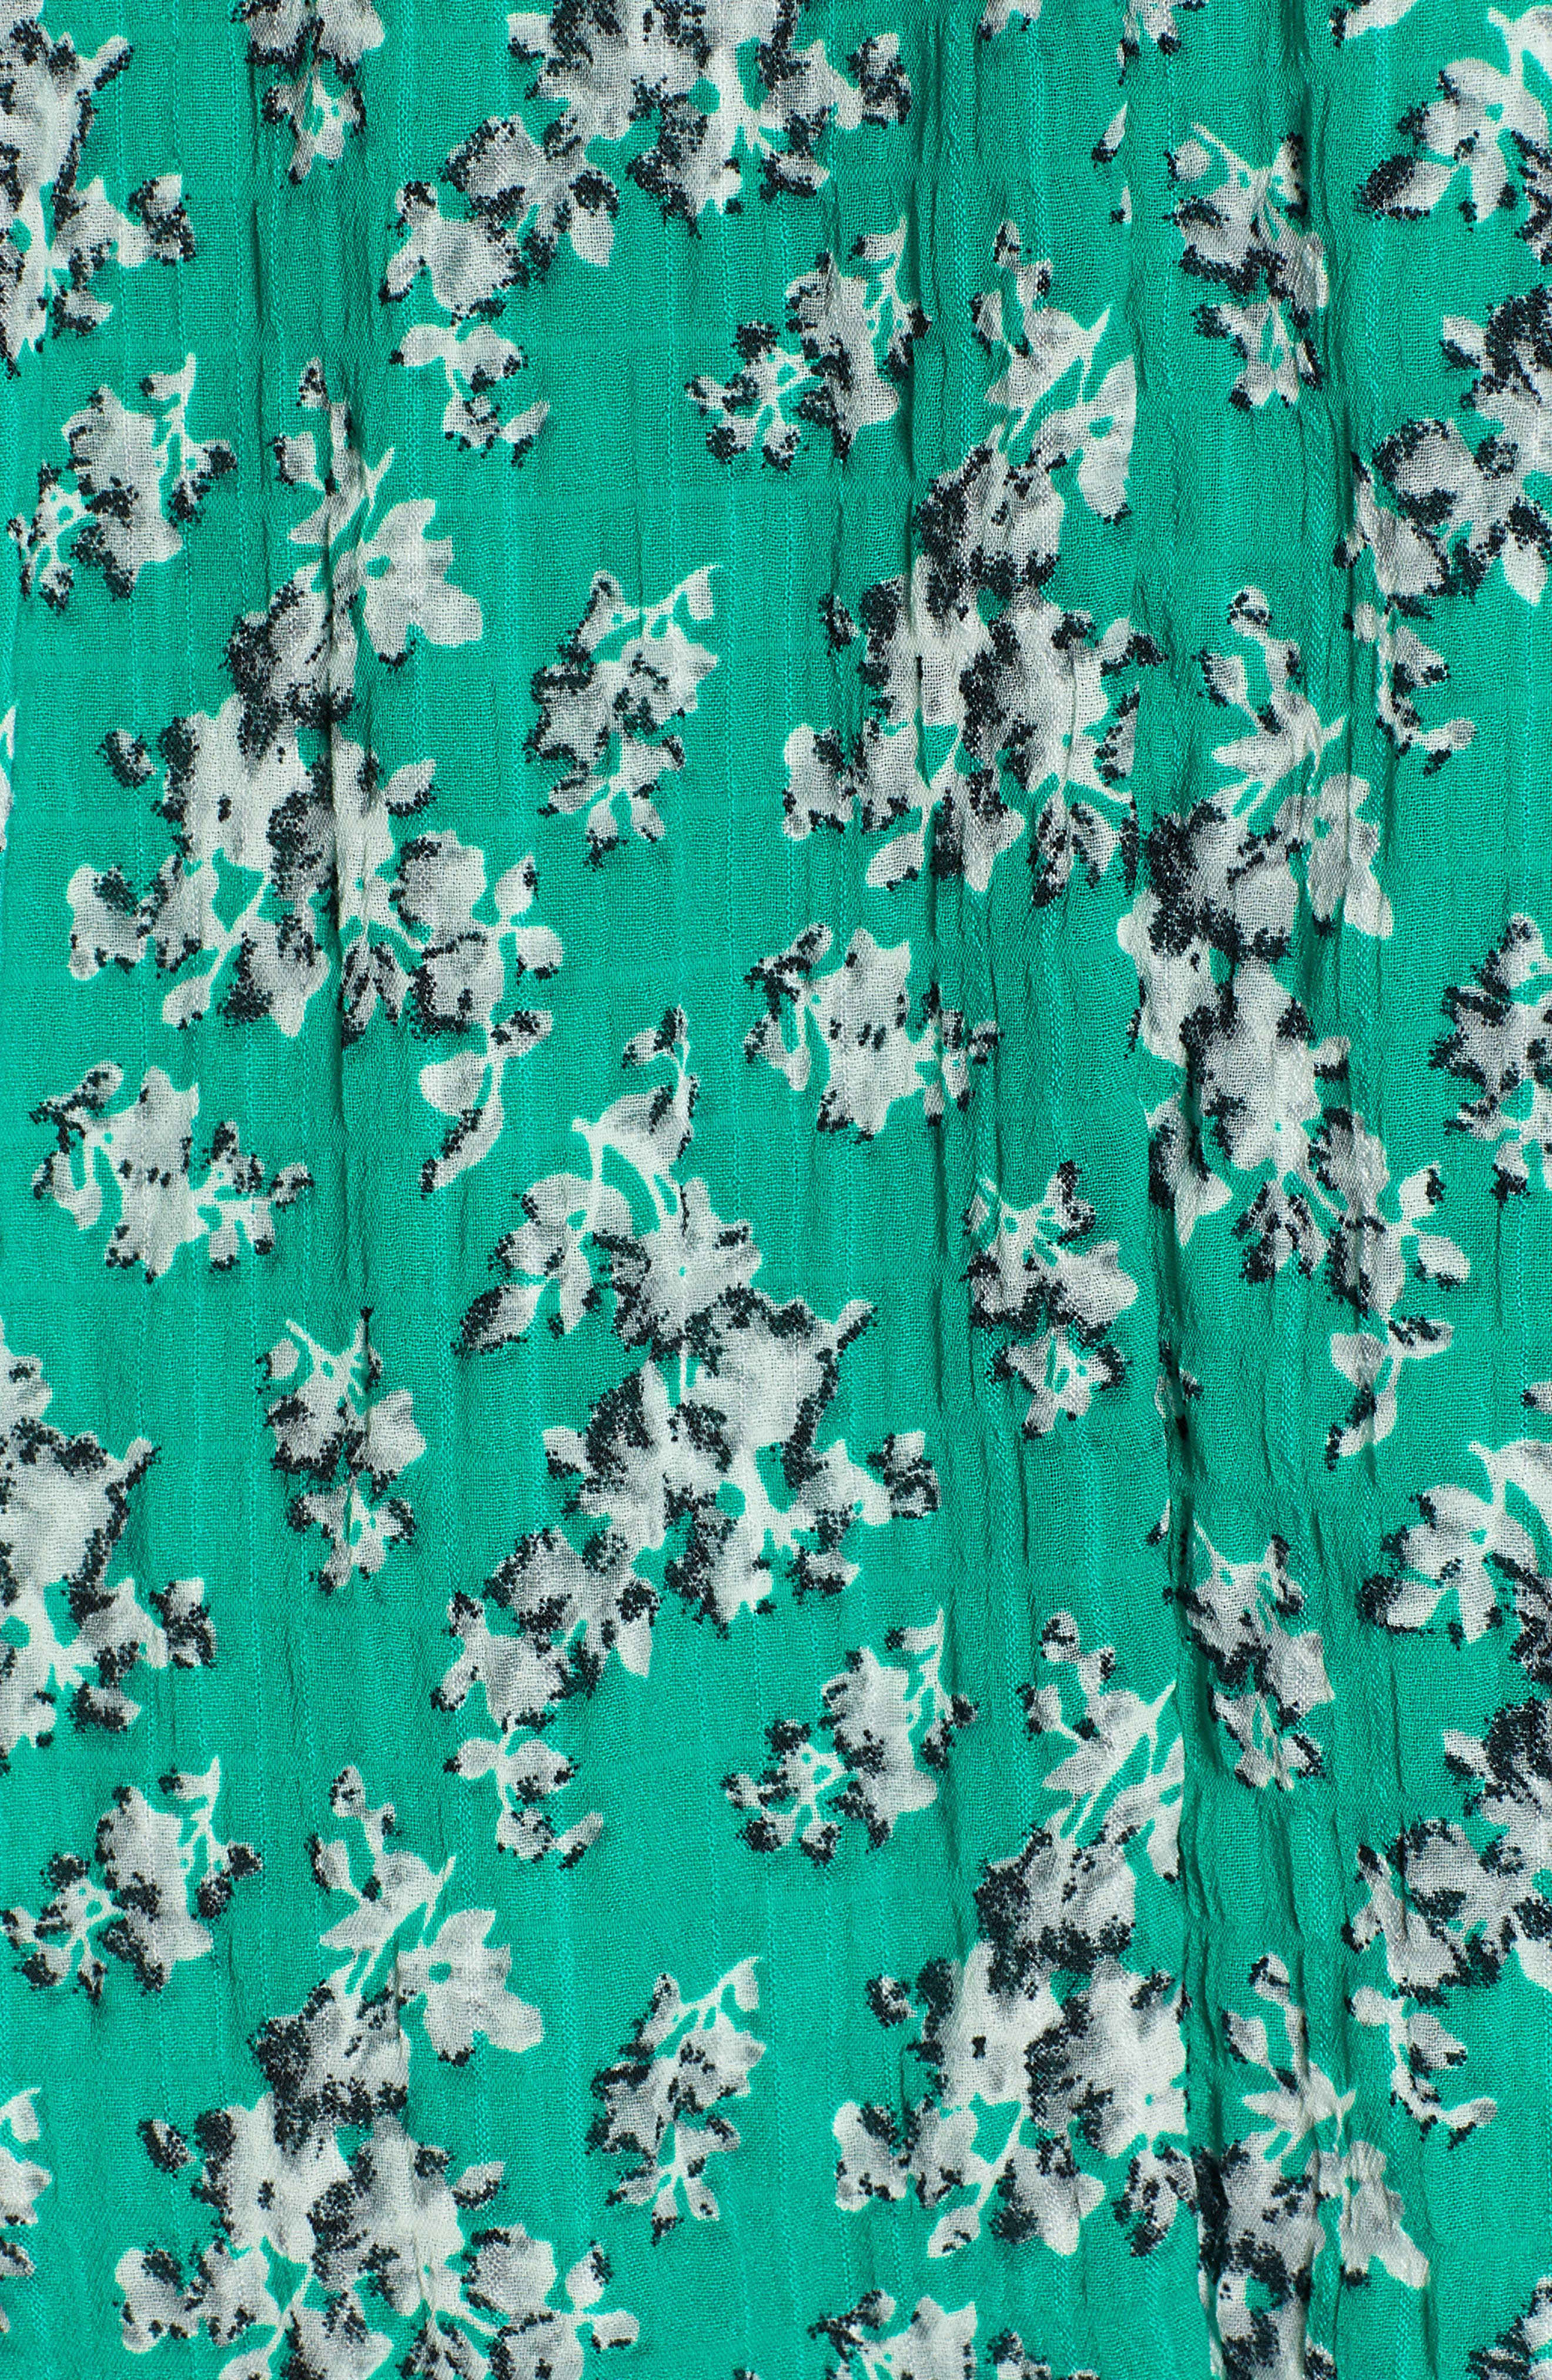 Adventurer Floral Print High/Low Dress,                             Alternate thumbnail 6, color,                             GREEN FLORAL